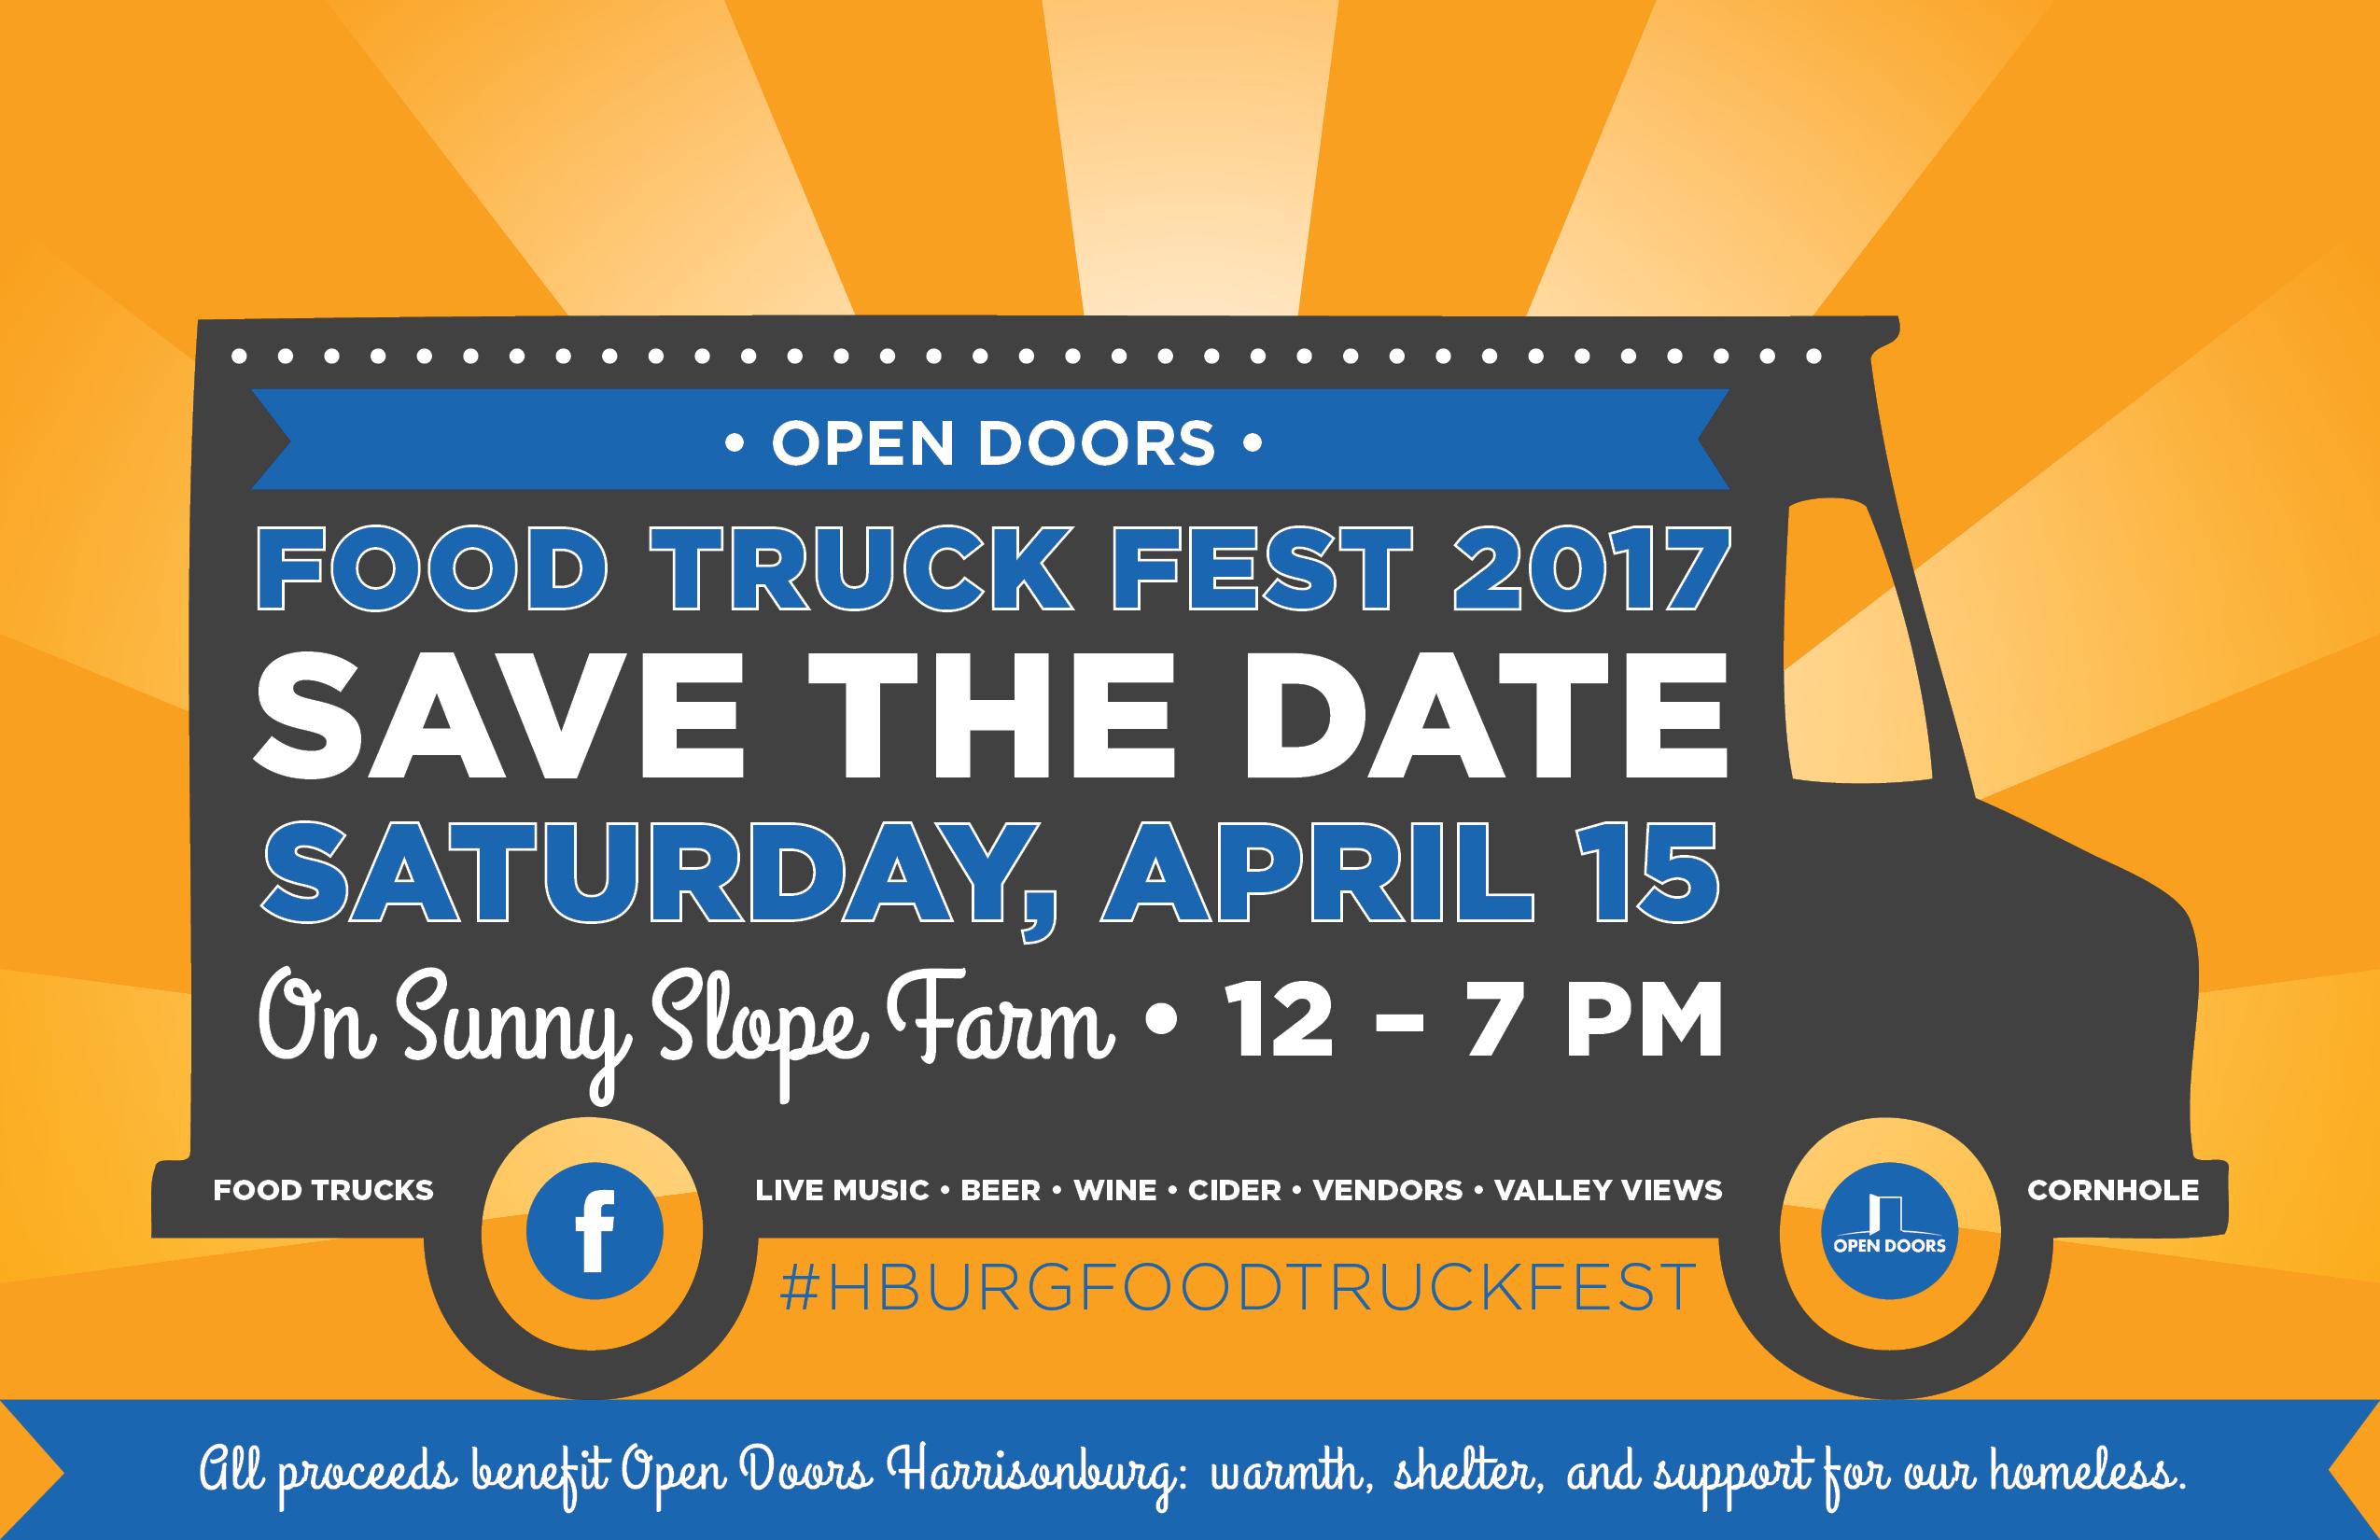 Food Truck Fest 2017 On Sunny Slope Farm